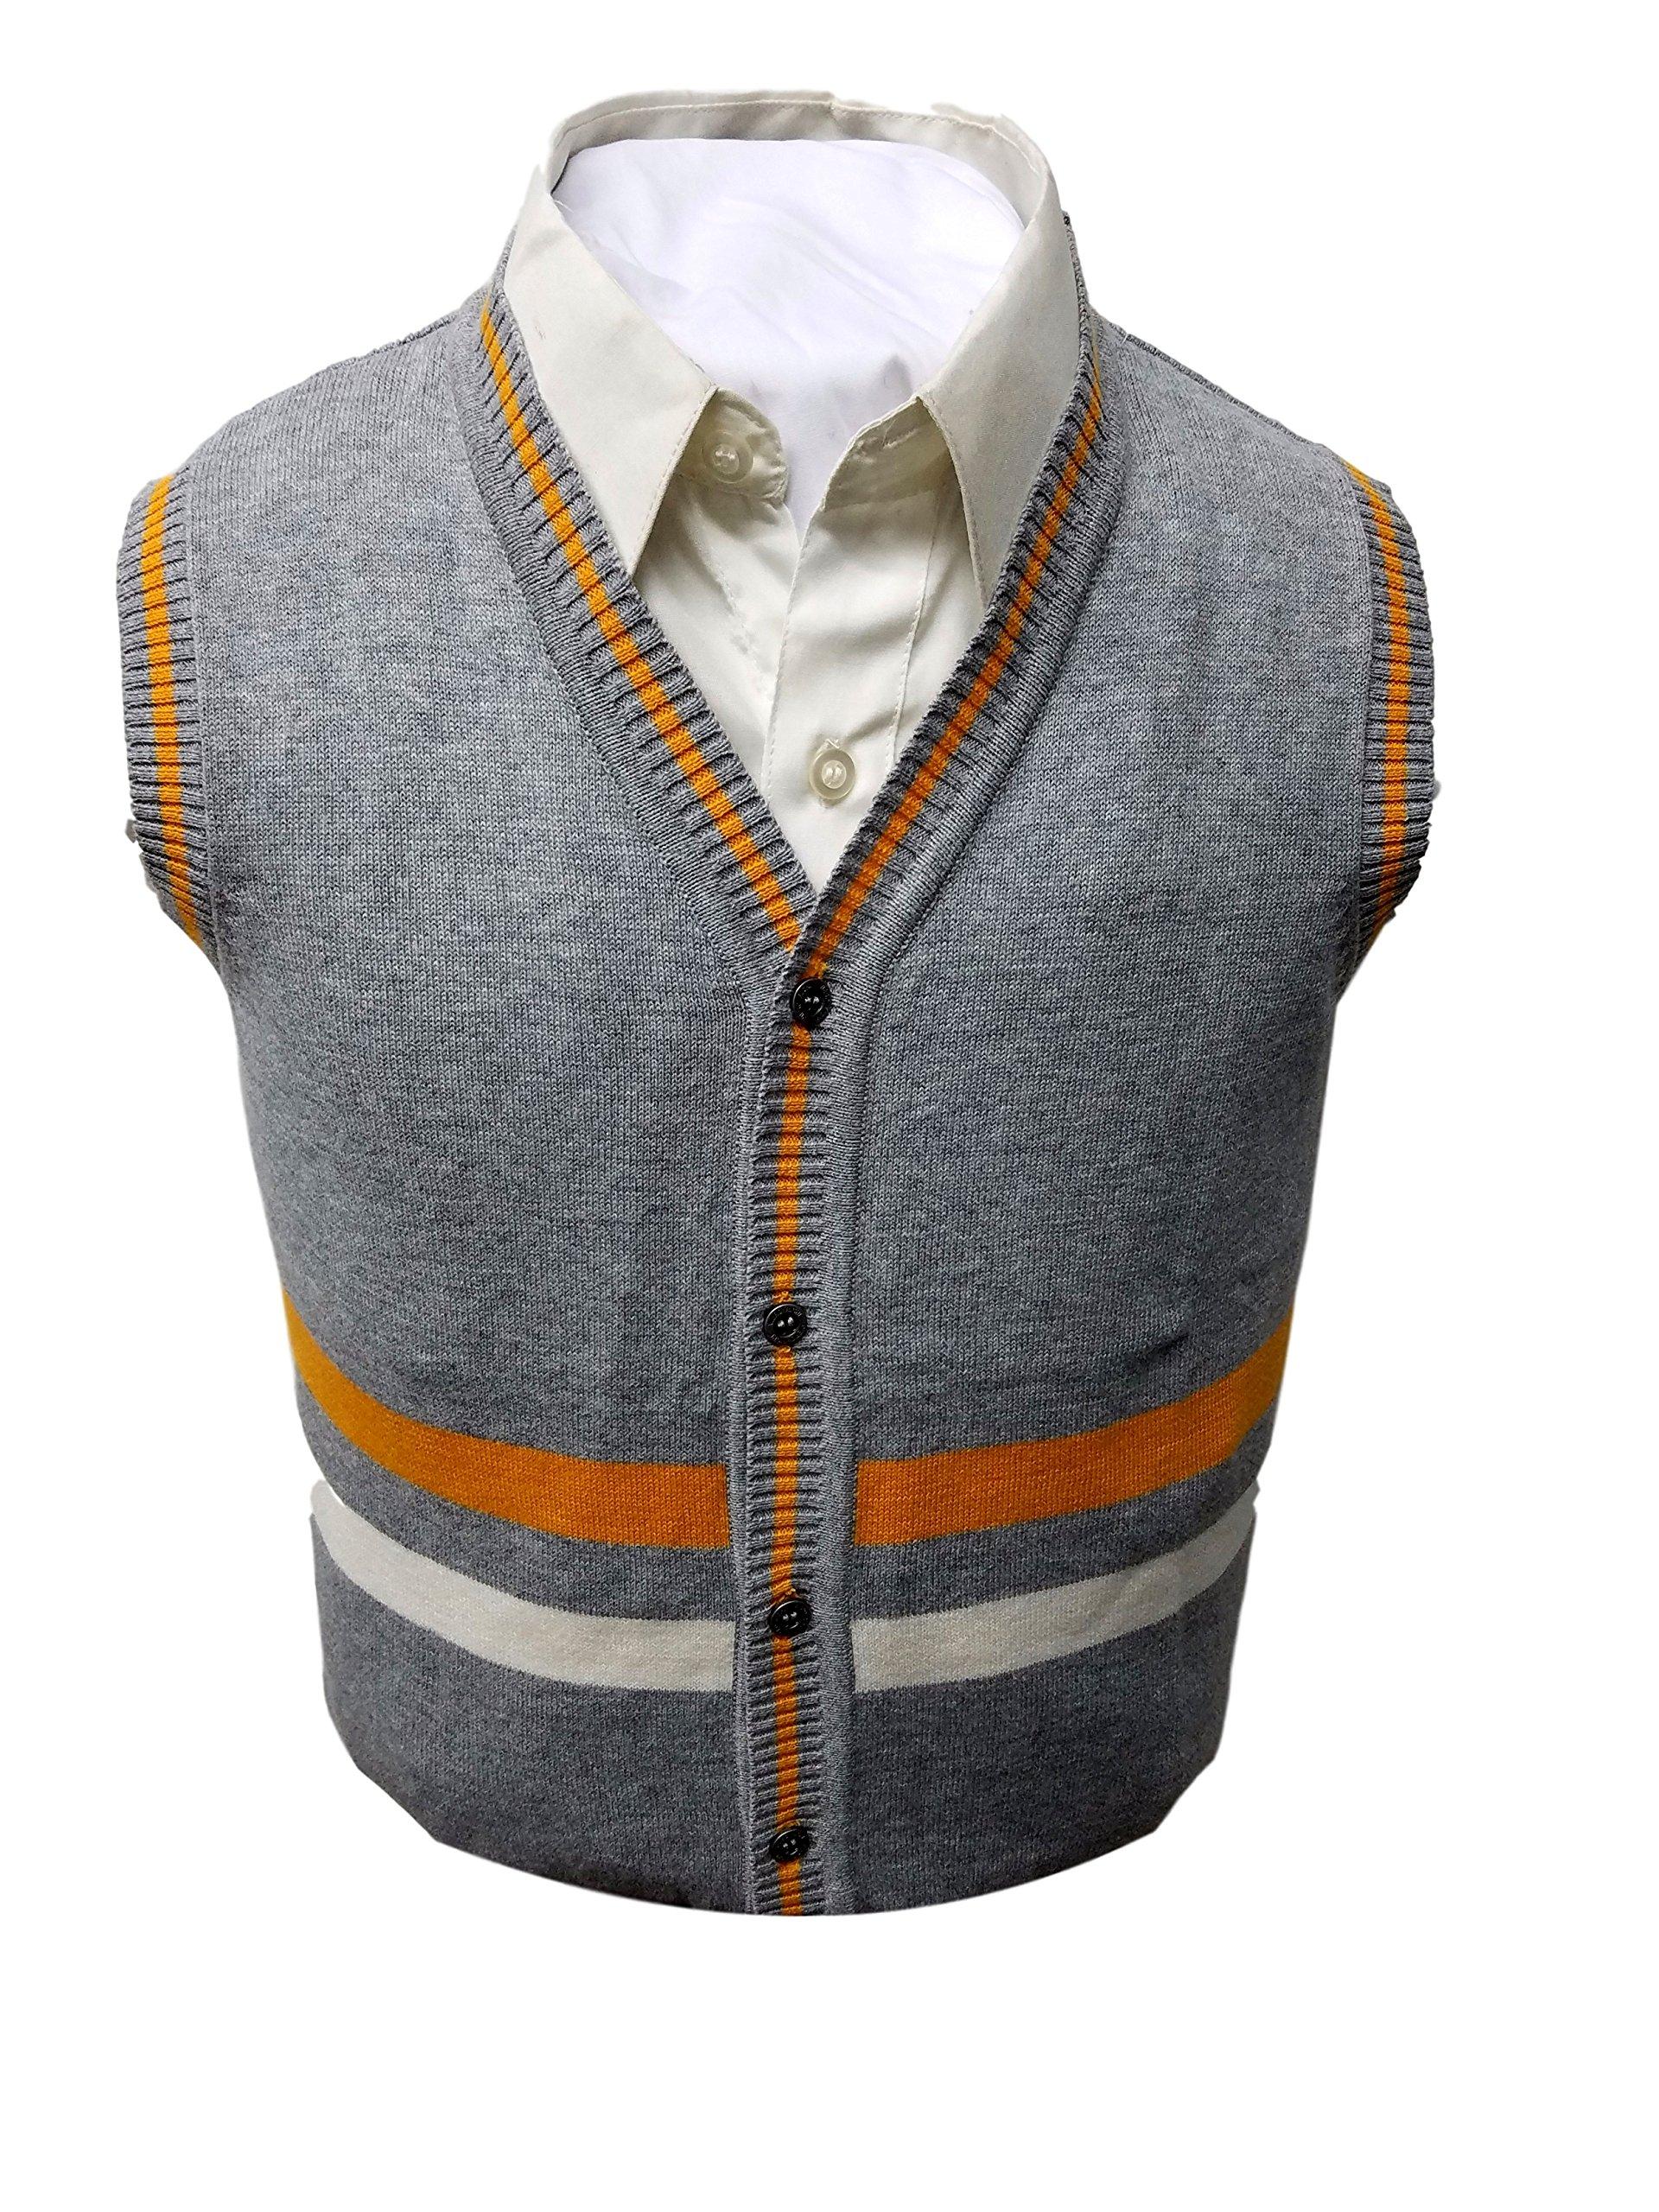 Viero Richi Vest Sweater 100% Cotton 2381 (12)